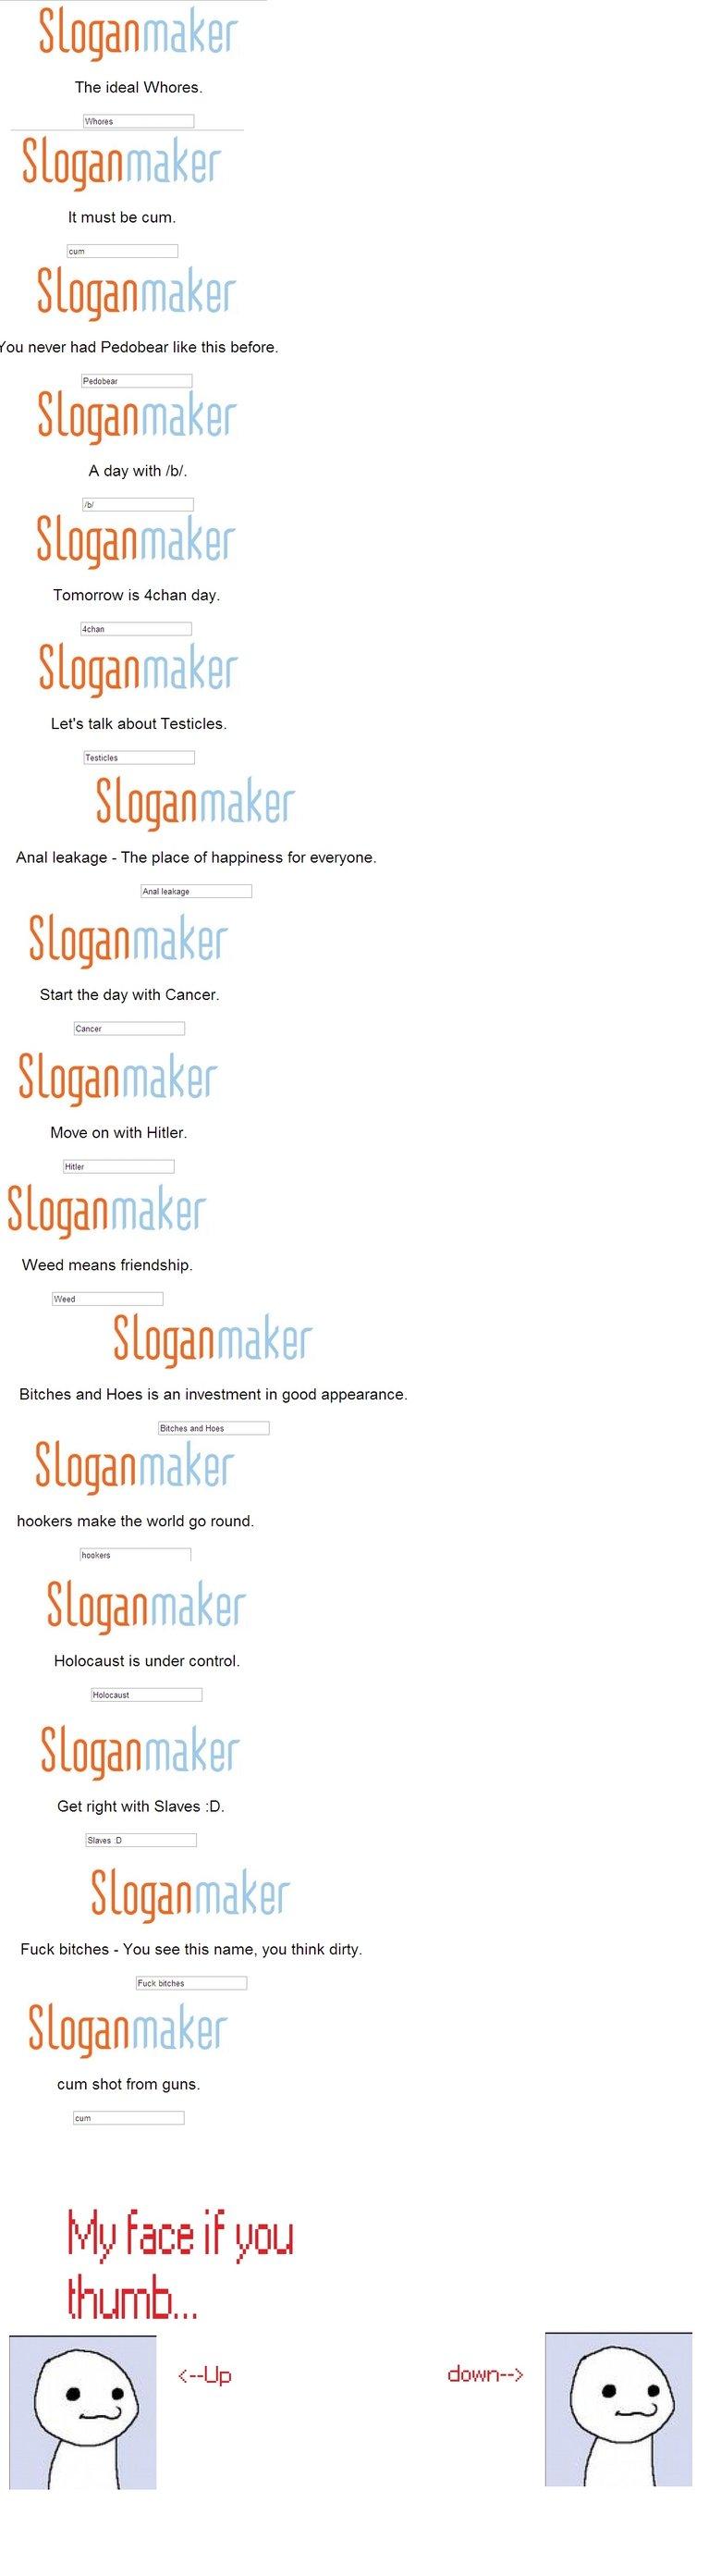 slogan maker comp 1. +10 for moar<br /> -10 never again. Sloganmaker The ideal Whores. Sloganmaker It must be cum. Sloganmaker mu never had Pedobear like  Slogan maker comp